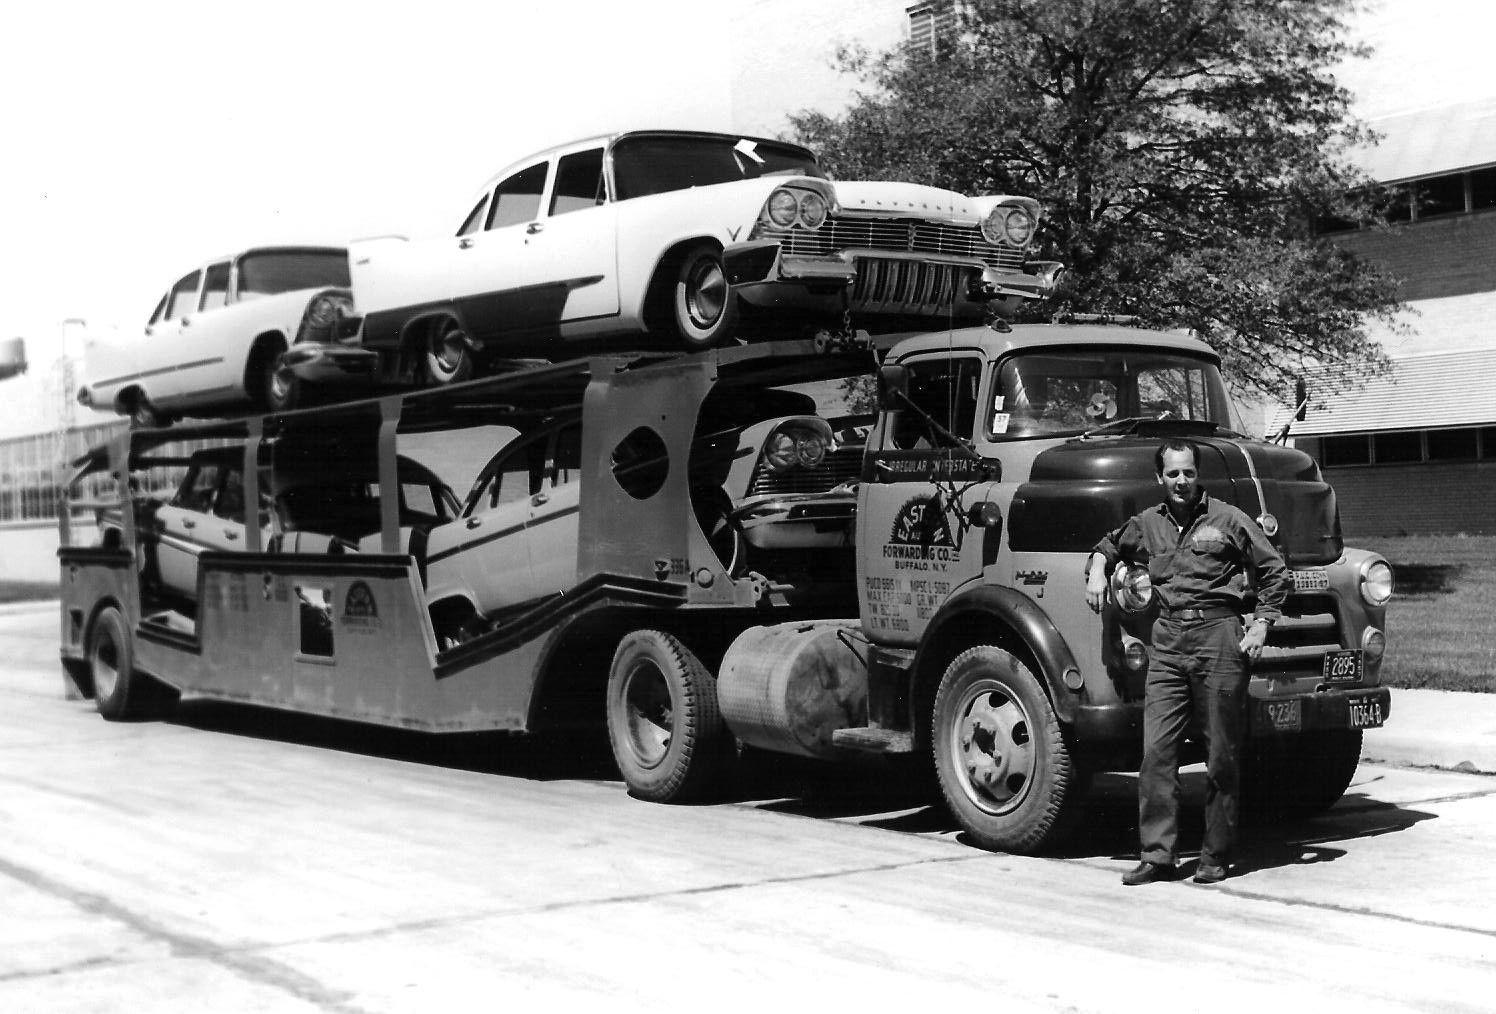 1956 Dodge Coe Car Hauler With 1957 Plymouths Car Haulers